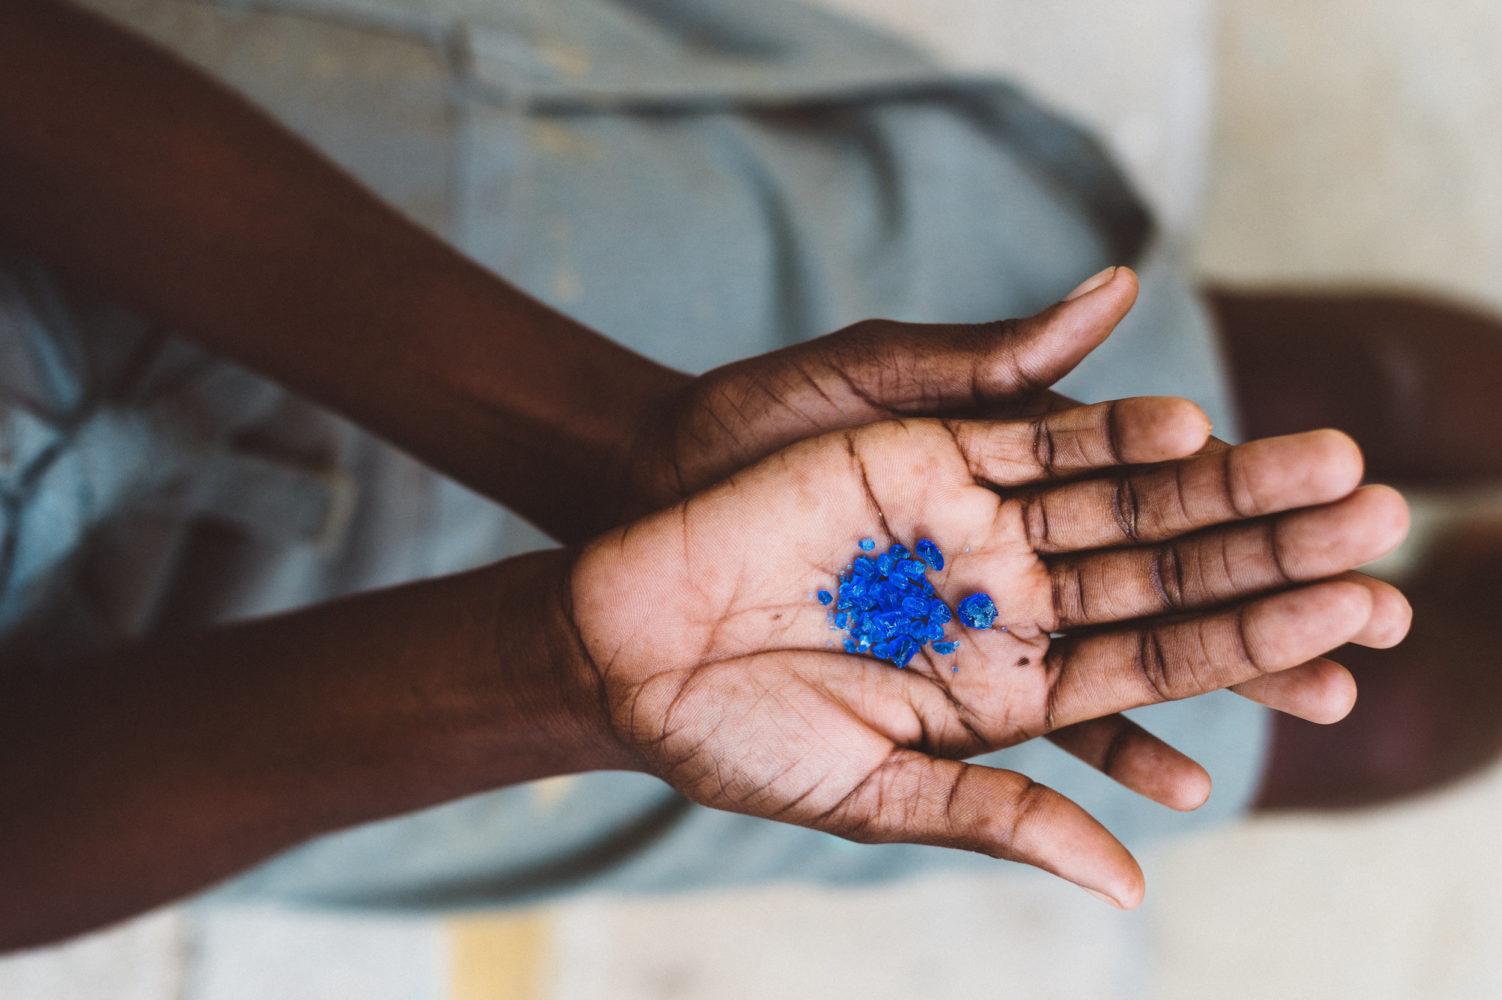 Haiti: Capturing Creativity